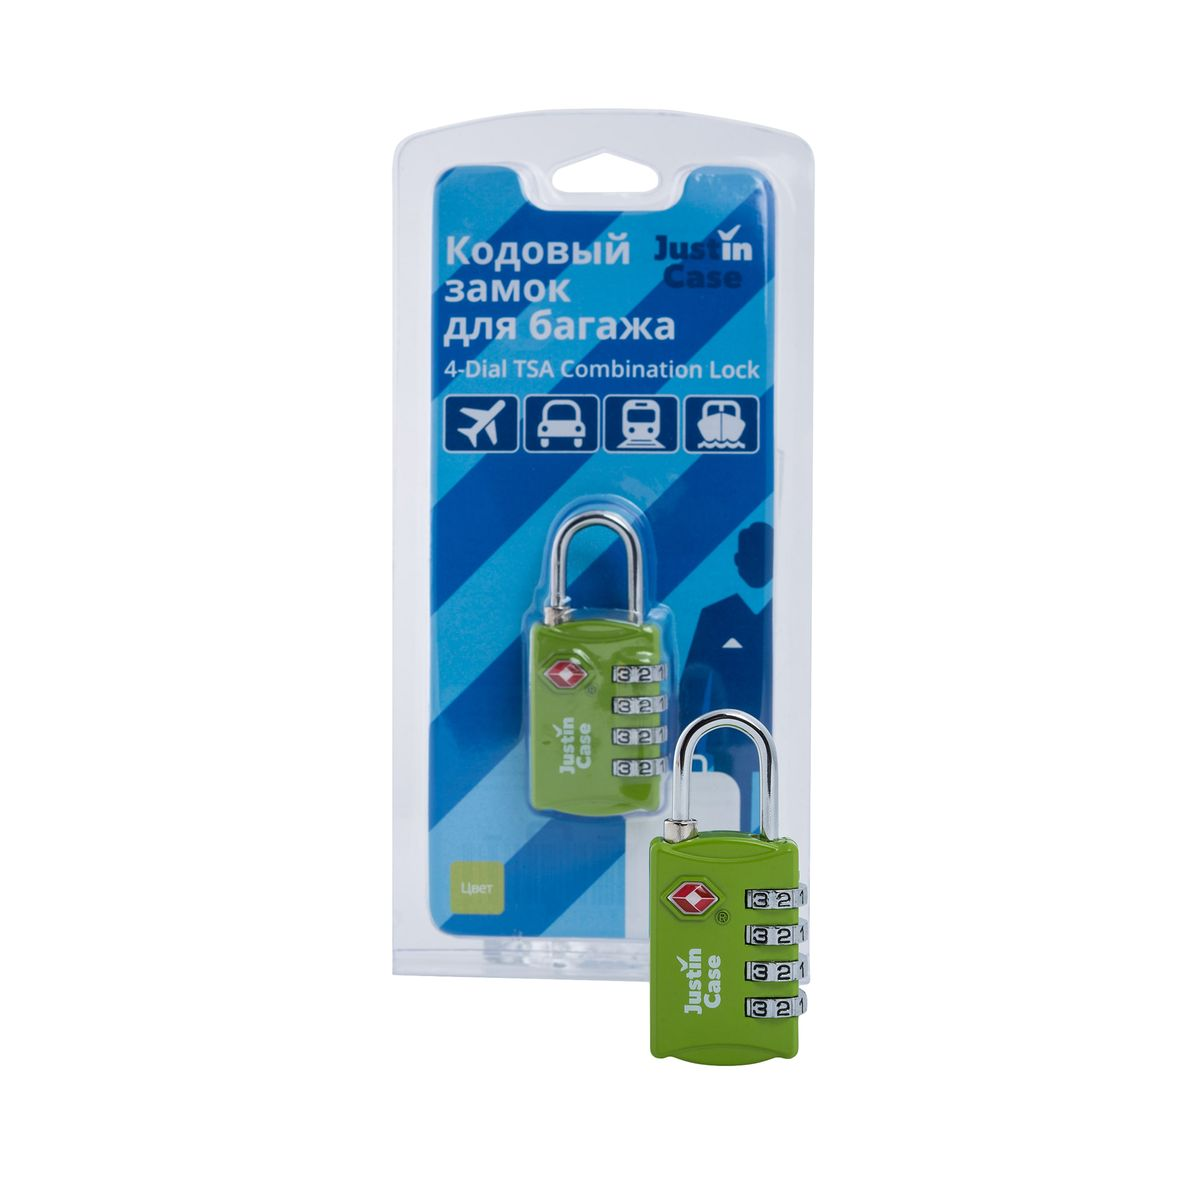 Замок кодовый для багажа JustinCase  4-Dial TSA Combination Lock , цвет: зеленый - Замки для багажа